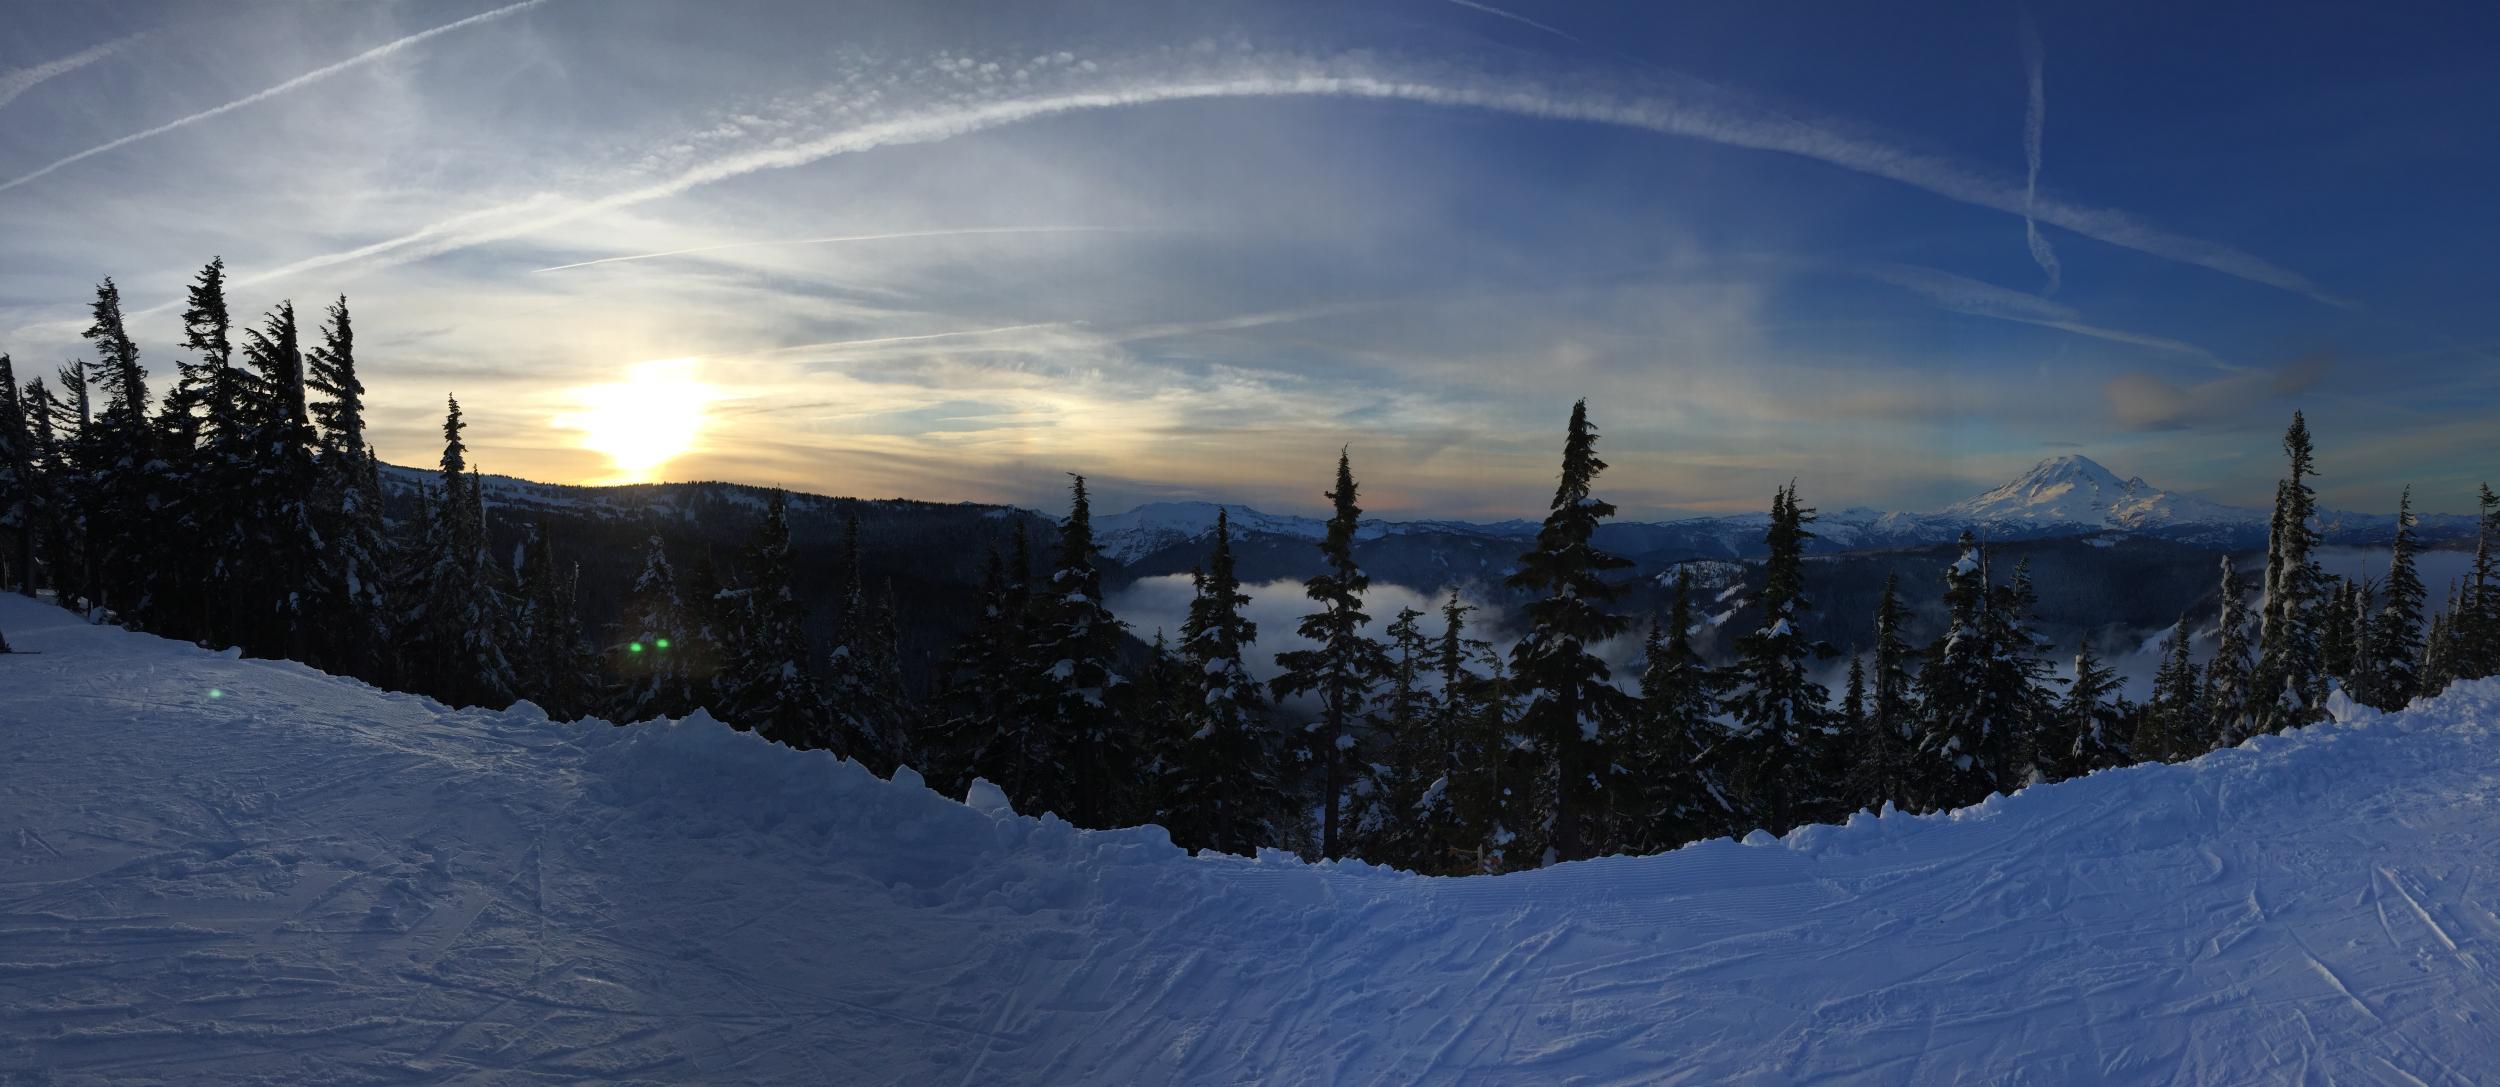 16. Sunset at White Pazz